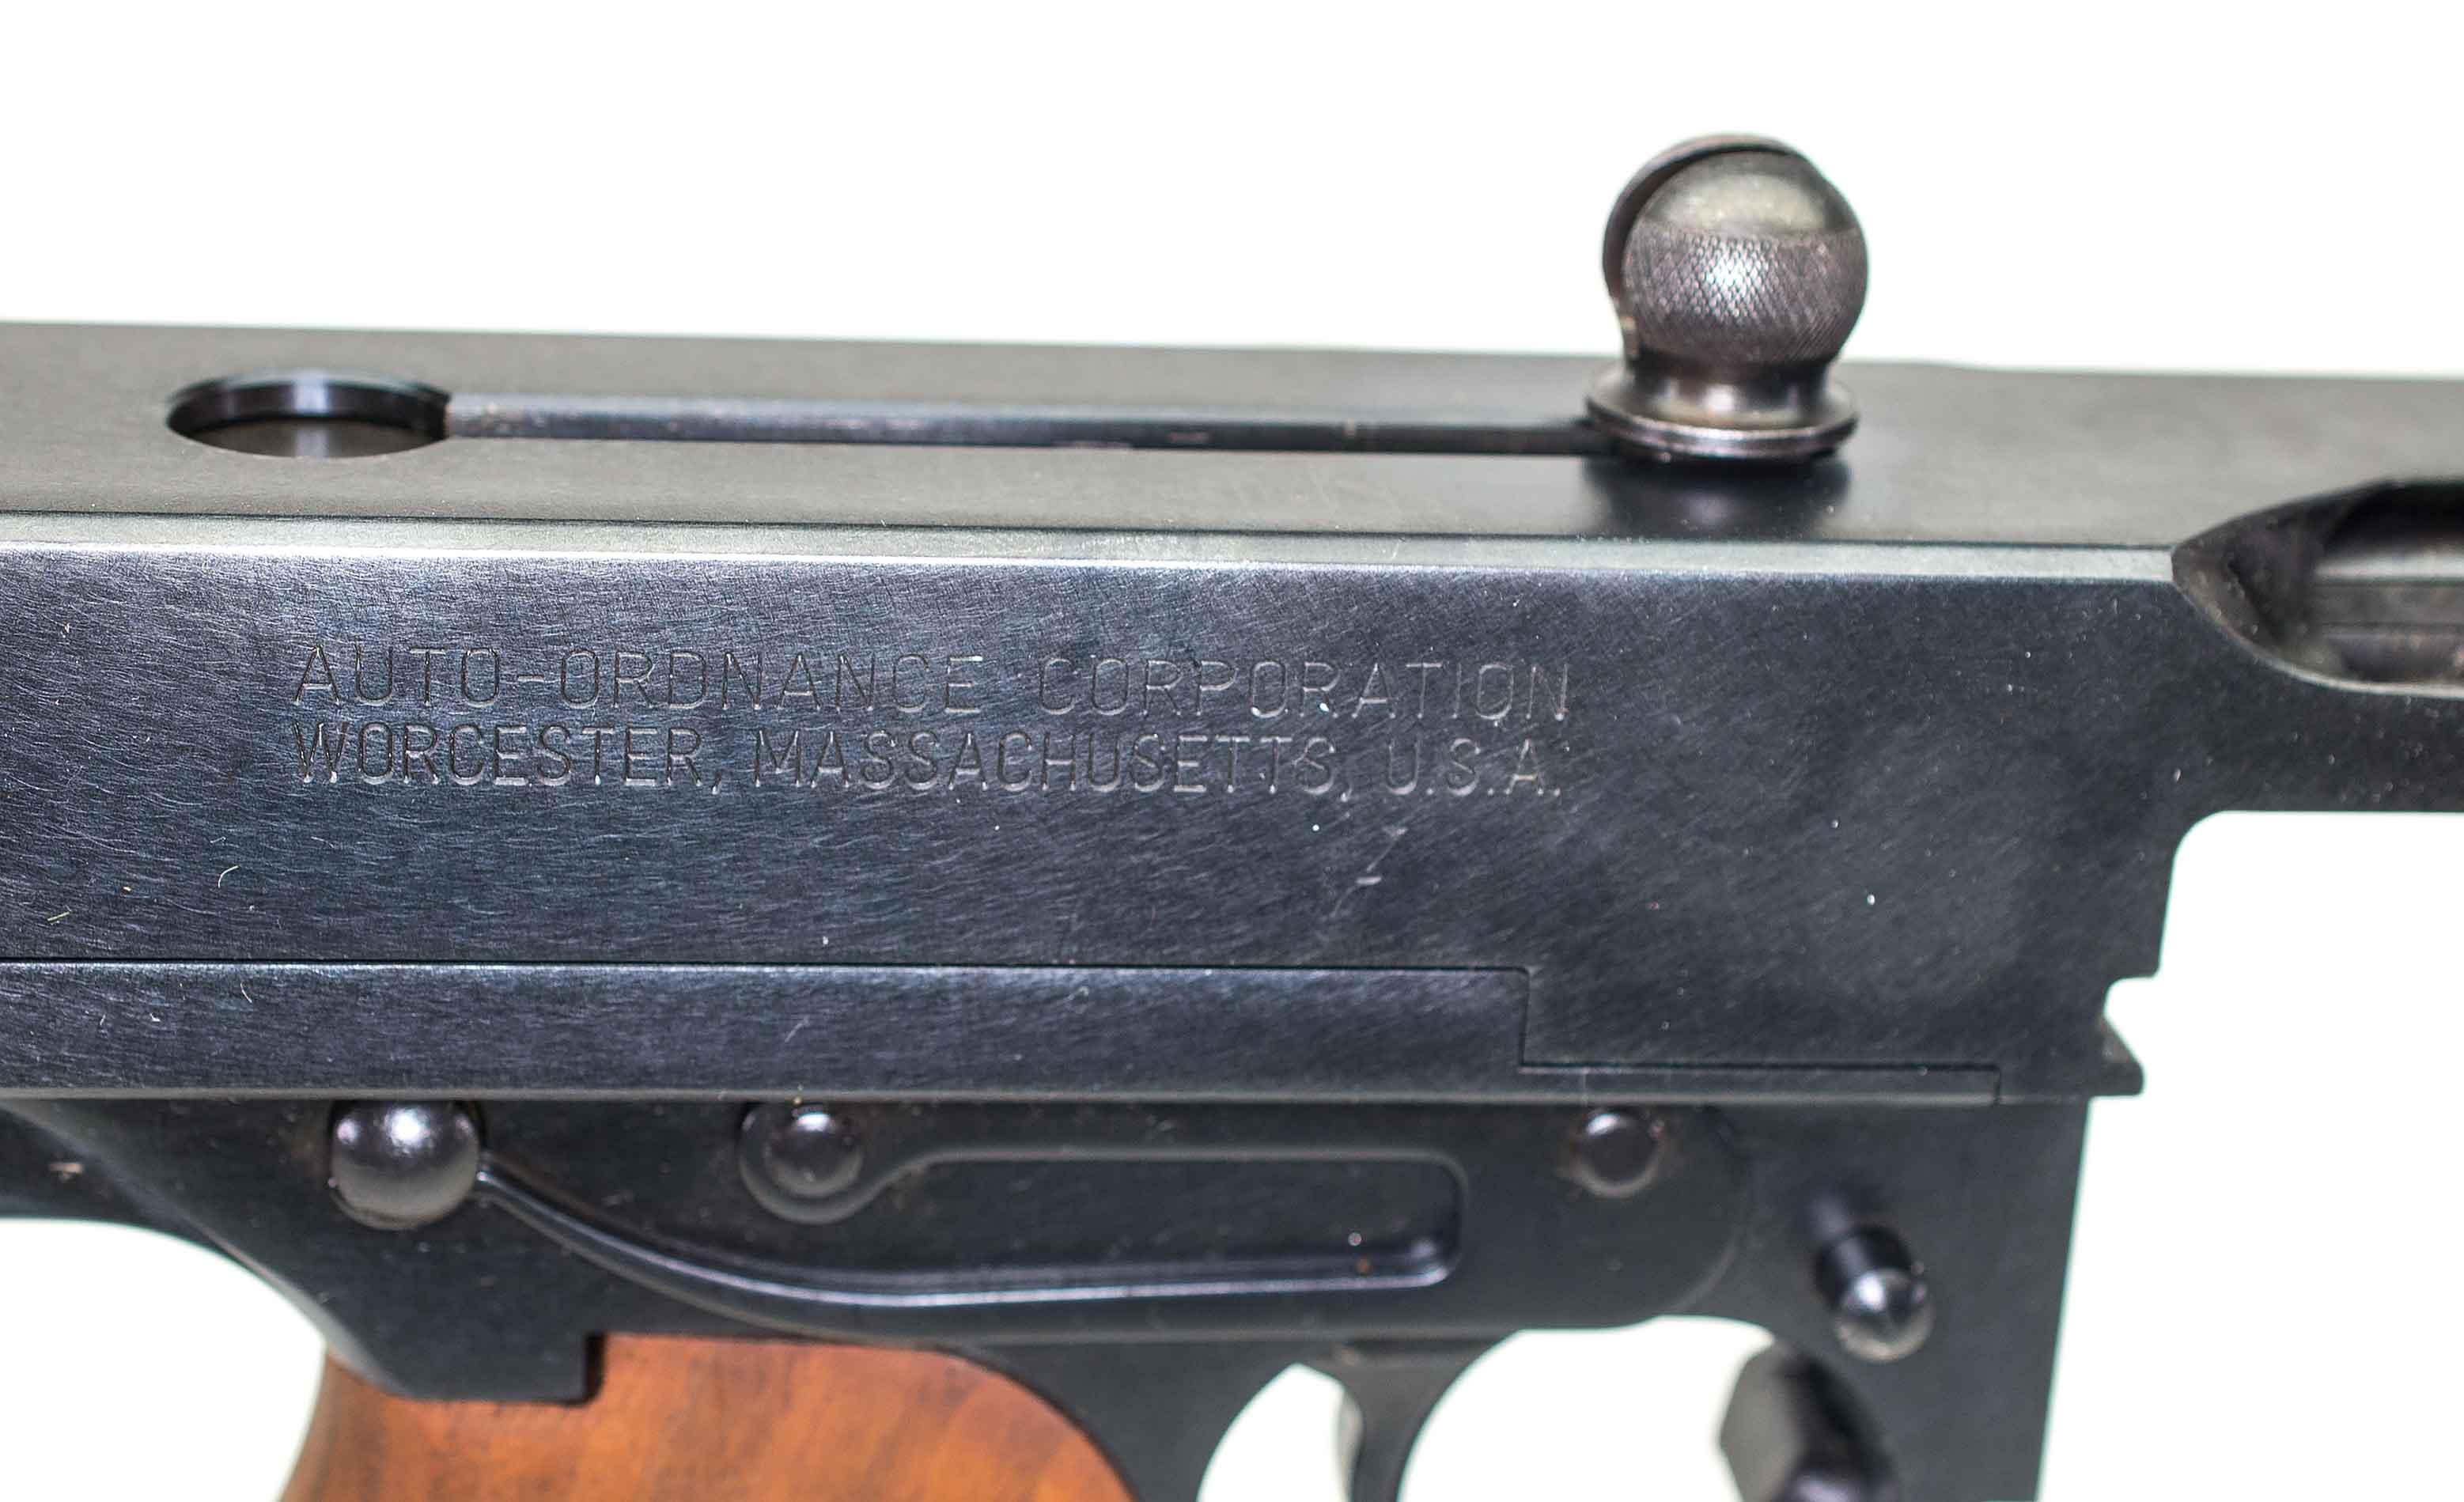 299a240bcbe616 THOMPSON  AUTO ORDNANCE 1927A1 .45ACP (Auction ID  9412448